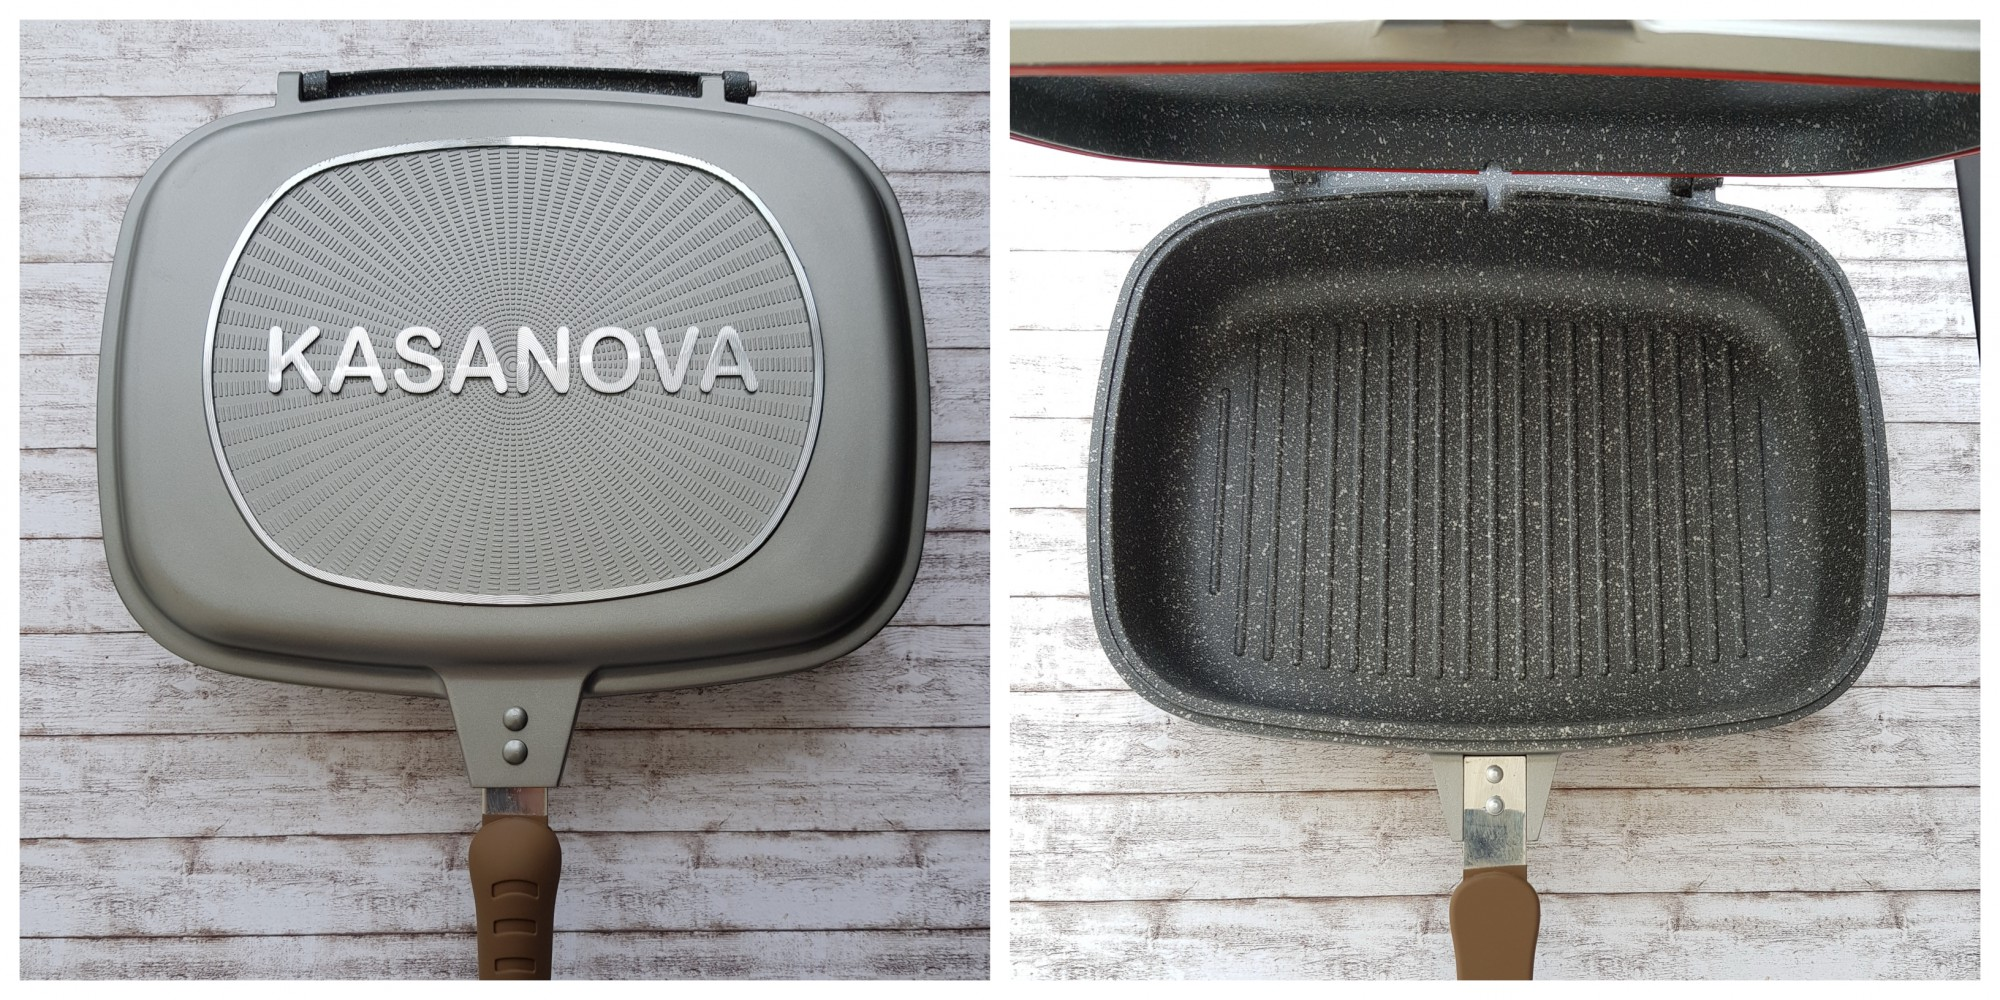 tigaie grill dublă kasanova